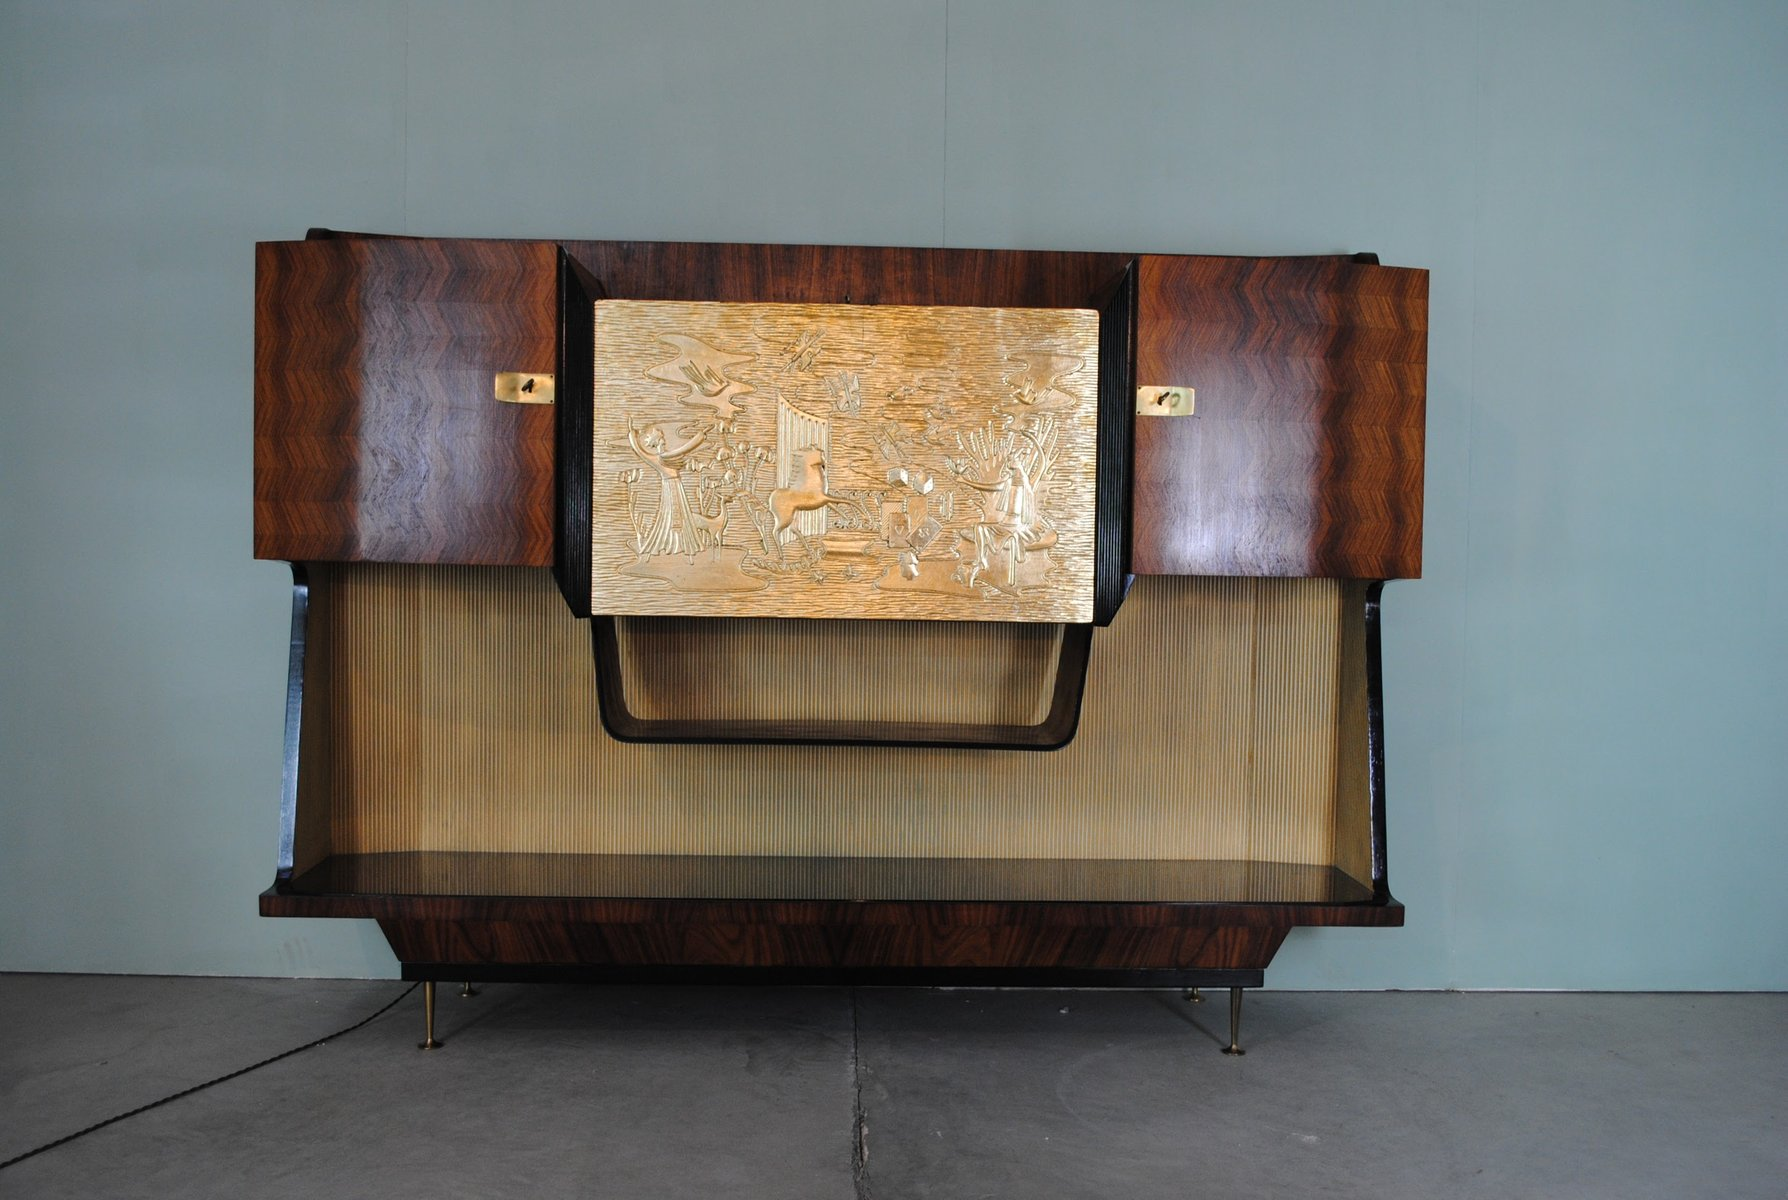 meuble bar vintage par osvaldo borsani italie en vente sur pamono. Black Bedroom Furniture Sets. Home Design Ideas